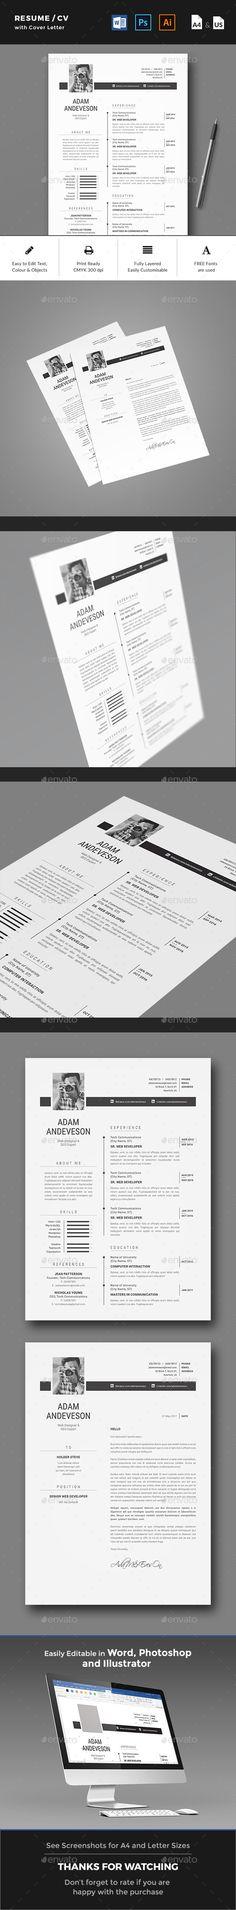 Resume CV Resume cv, Cv template and Cv design - resume paper size